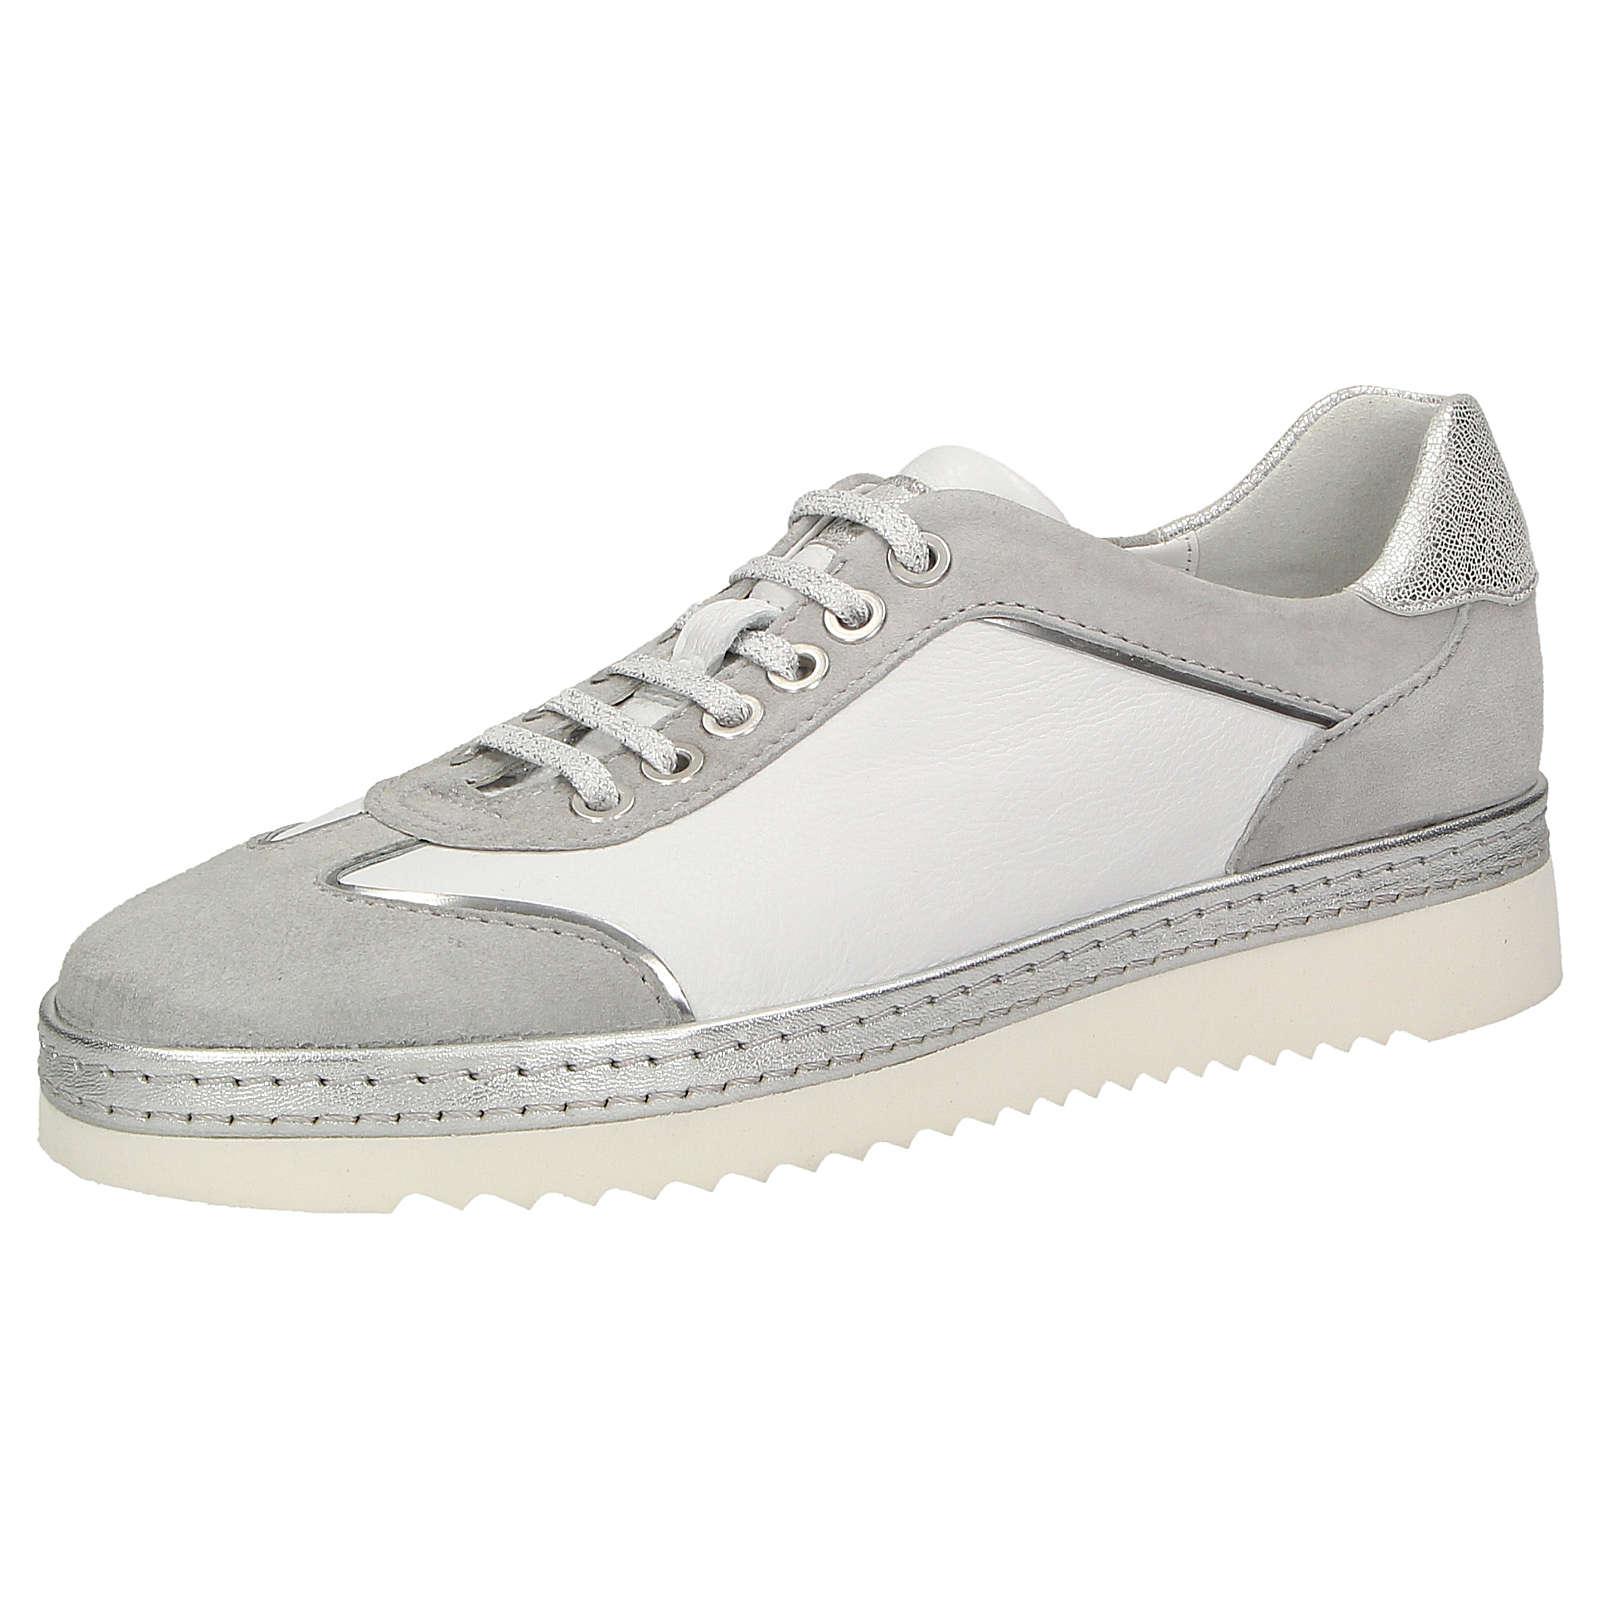 Sioux Sneaker Oxiria-701-XL Sneakers Low weiß Damen Gr. 39,5